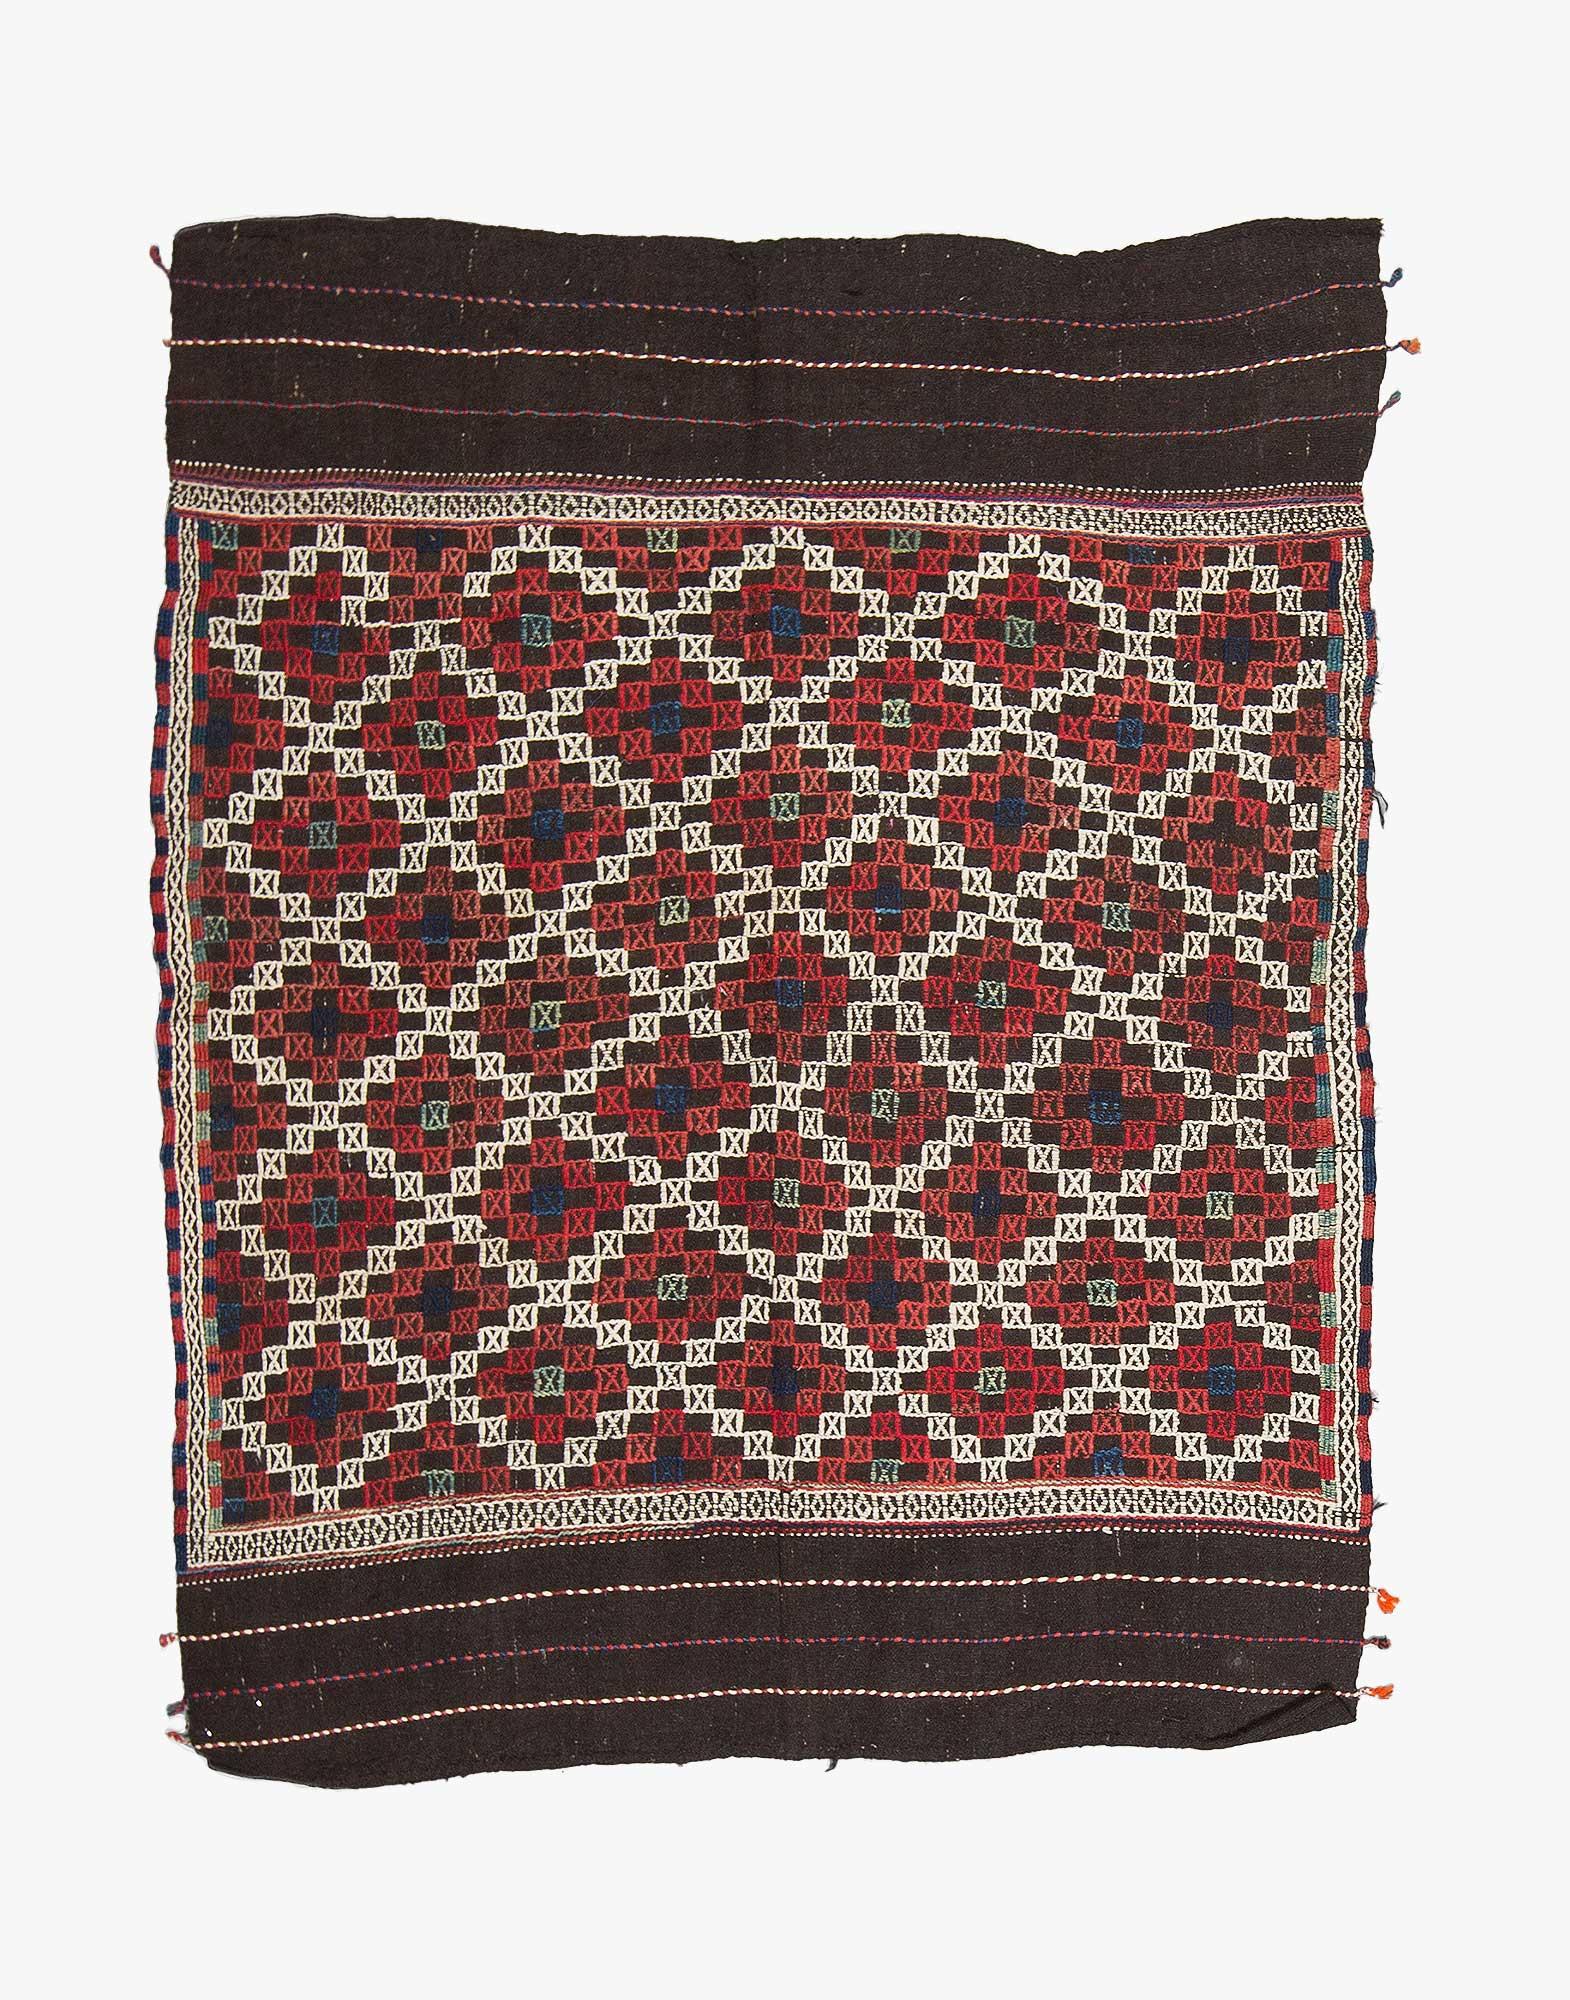 Bergama Zili Embroidered Kilim